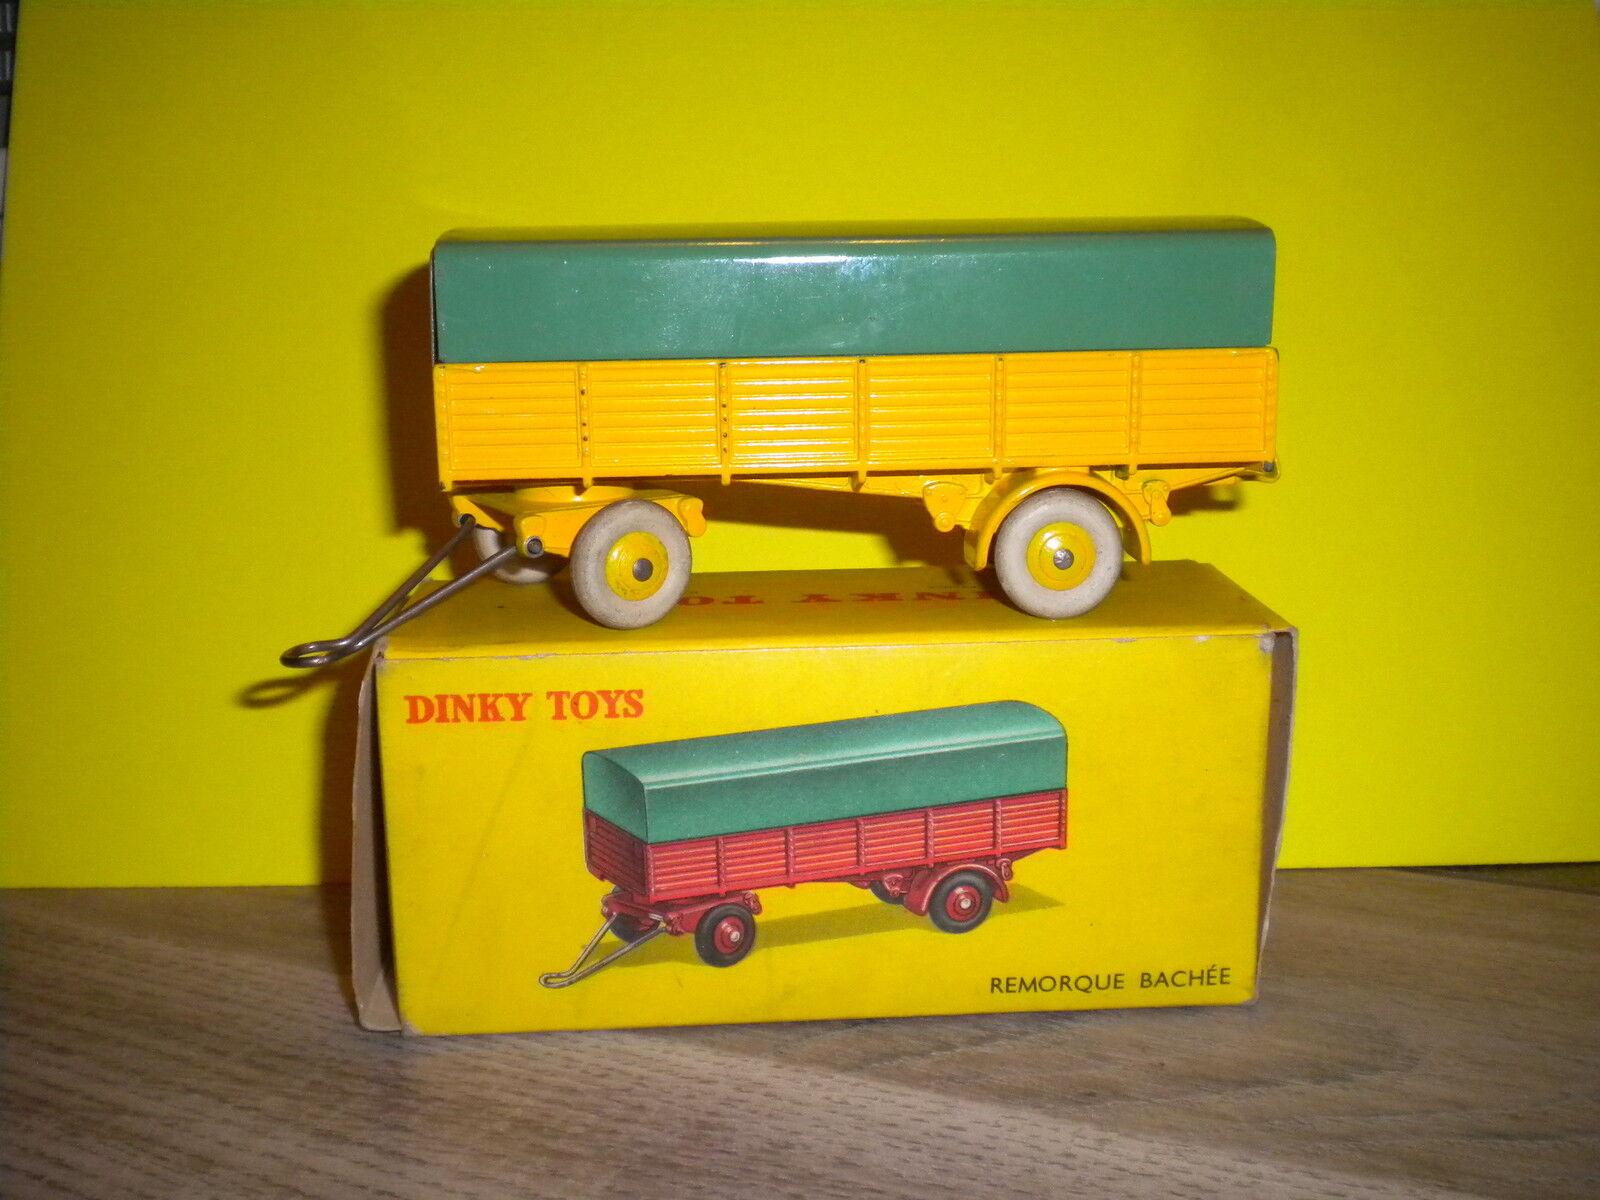 DINKY SpielzeugS = TRES BELLE REMORQUE BACHEE EN BOITE D ORIGINE REF 70